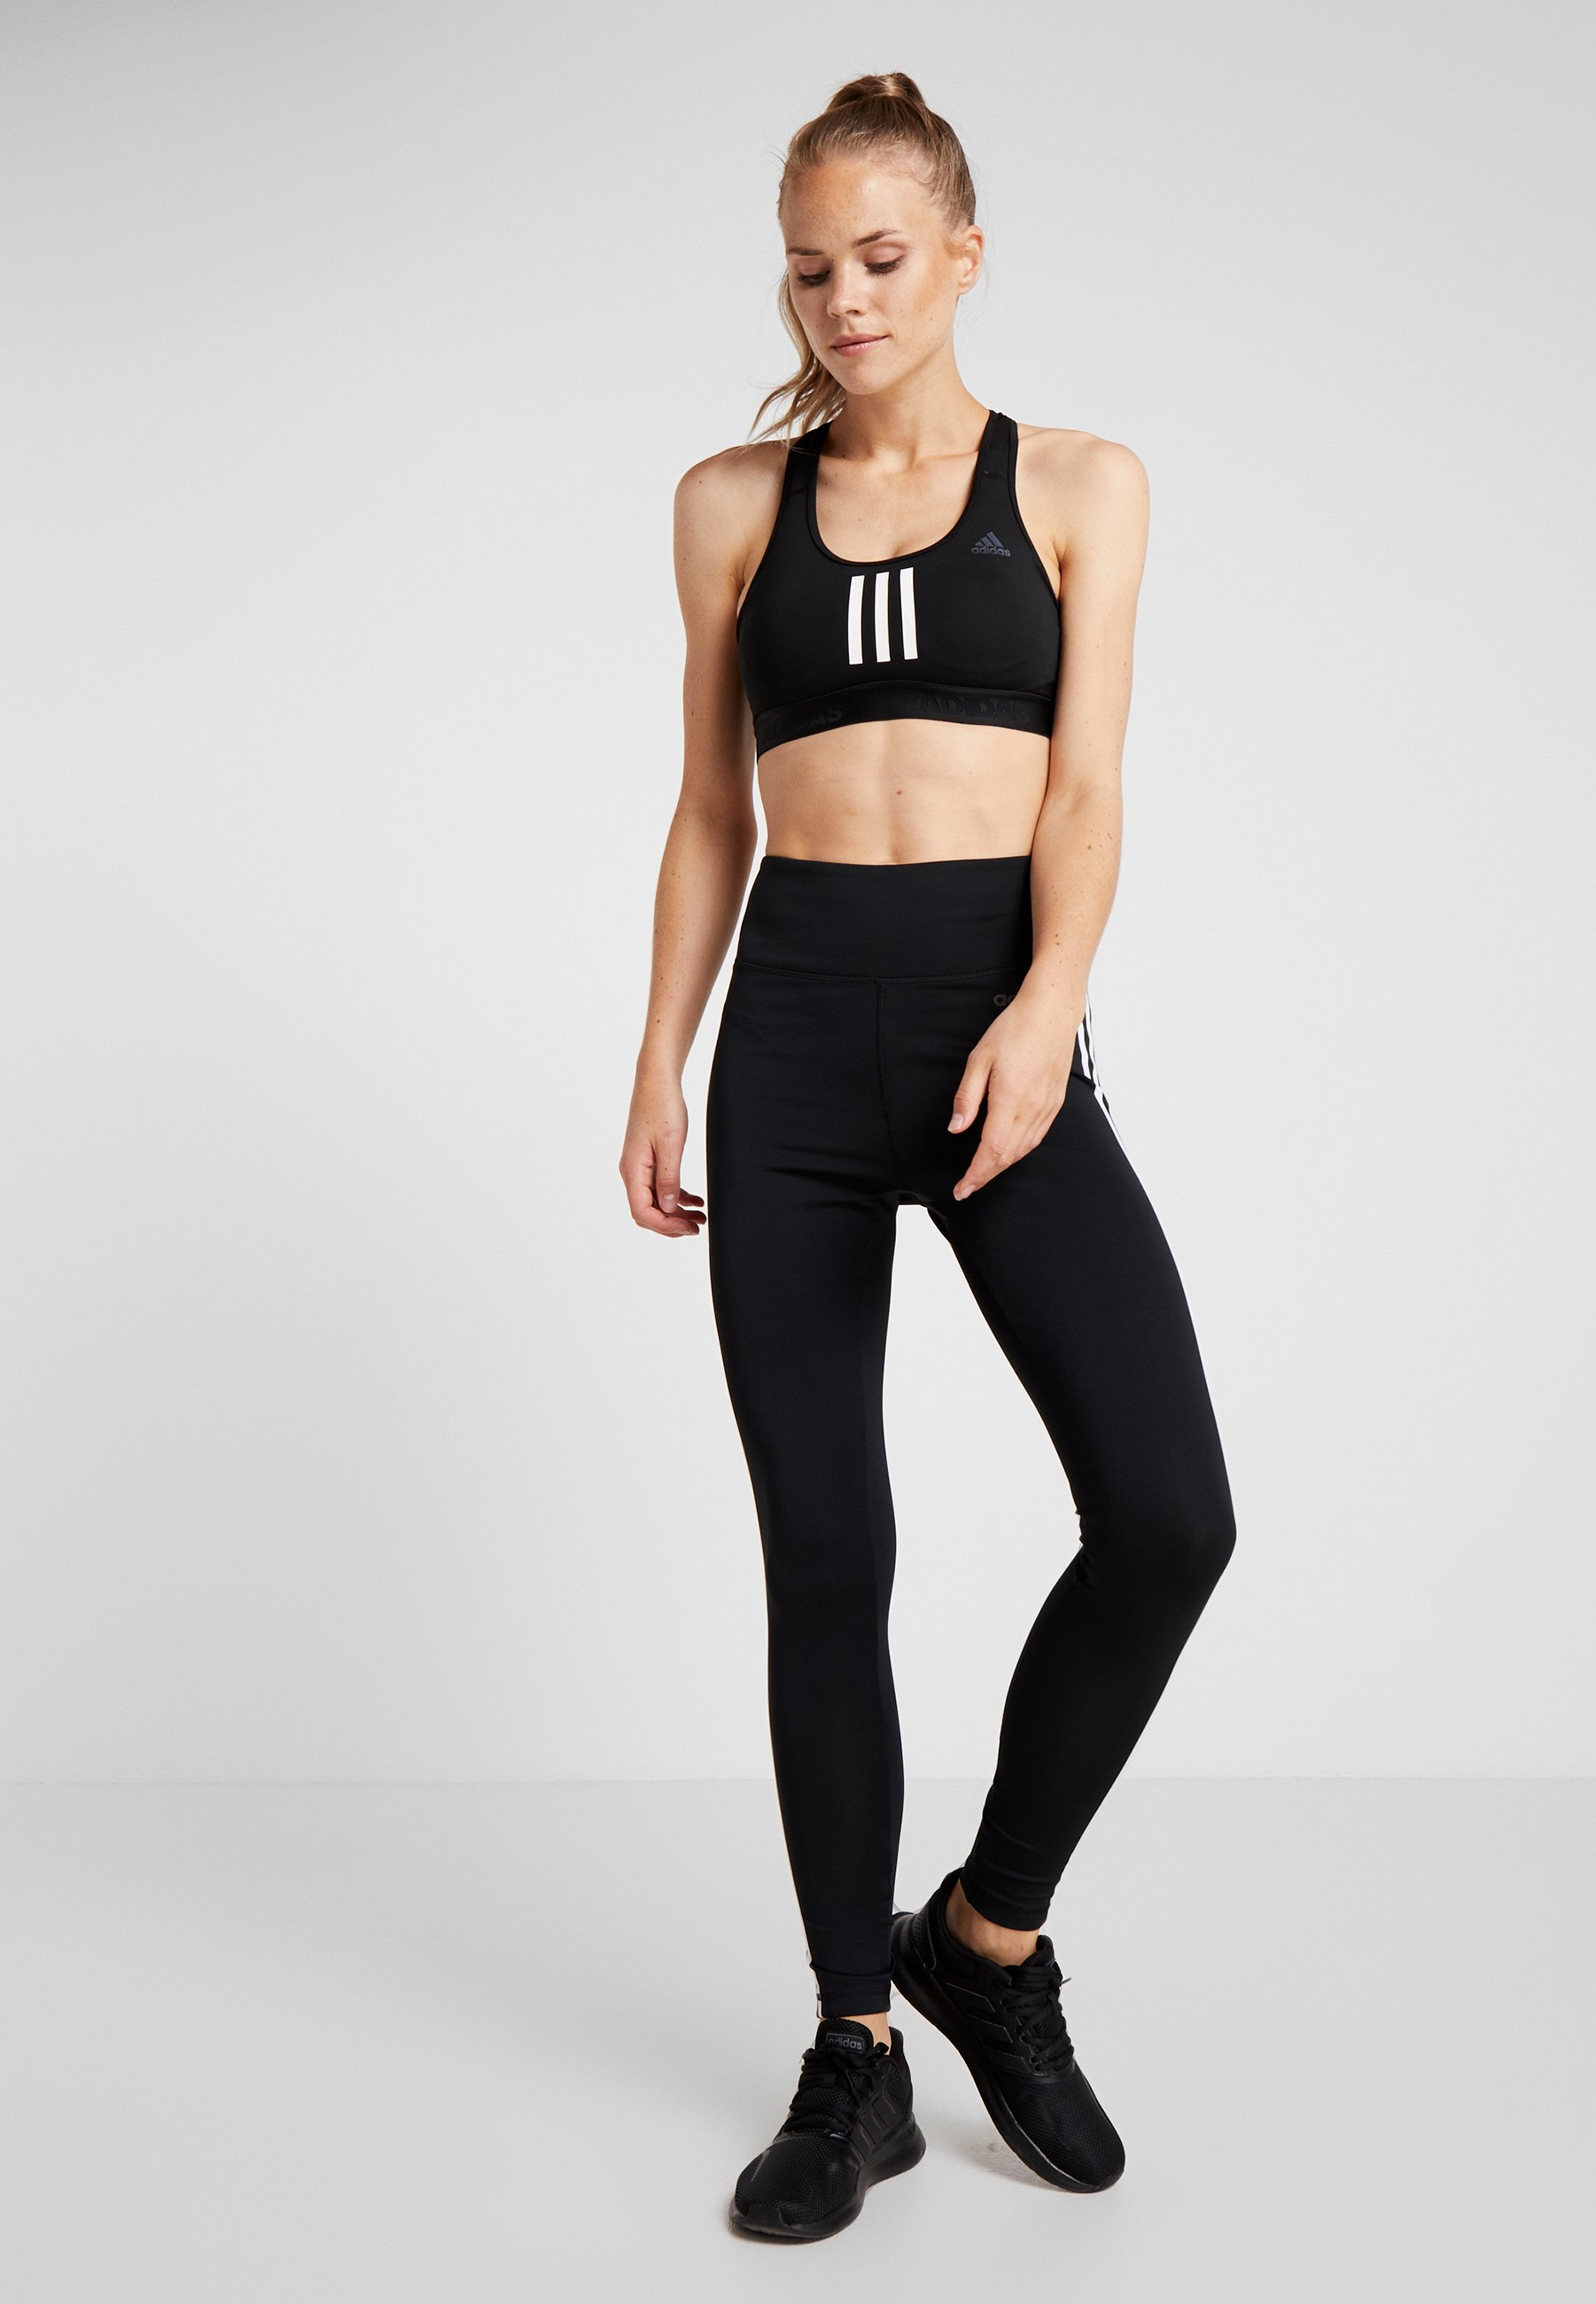 Adidas Performance Collants - Black